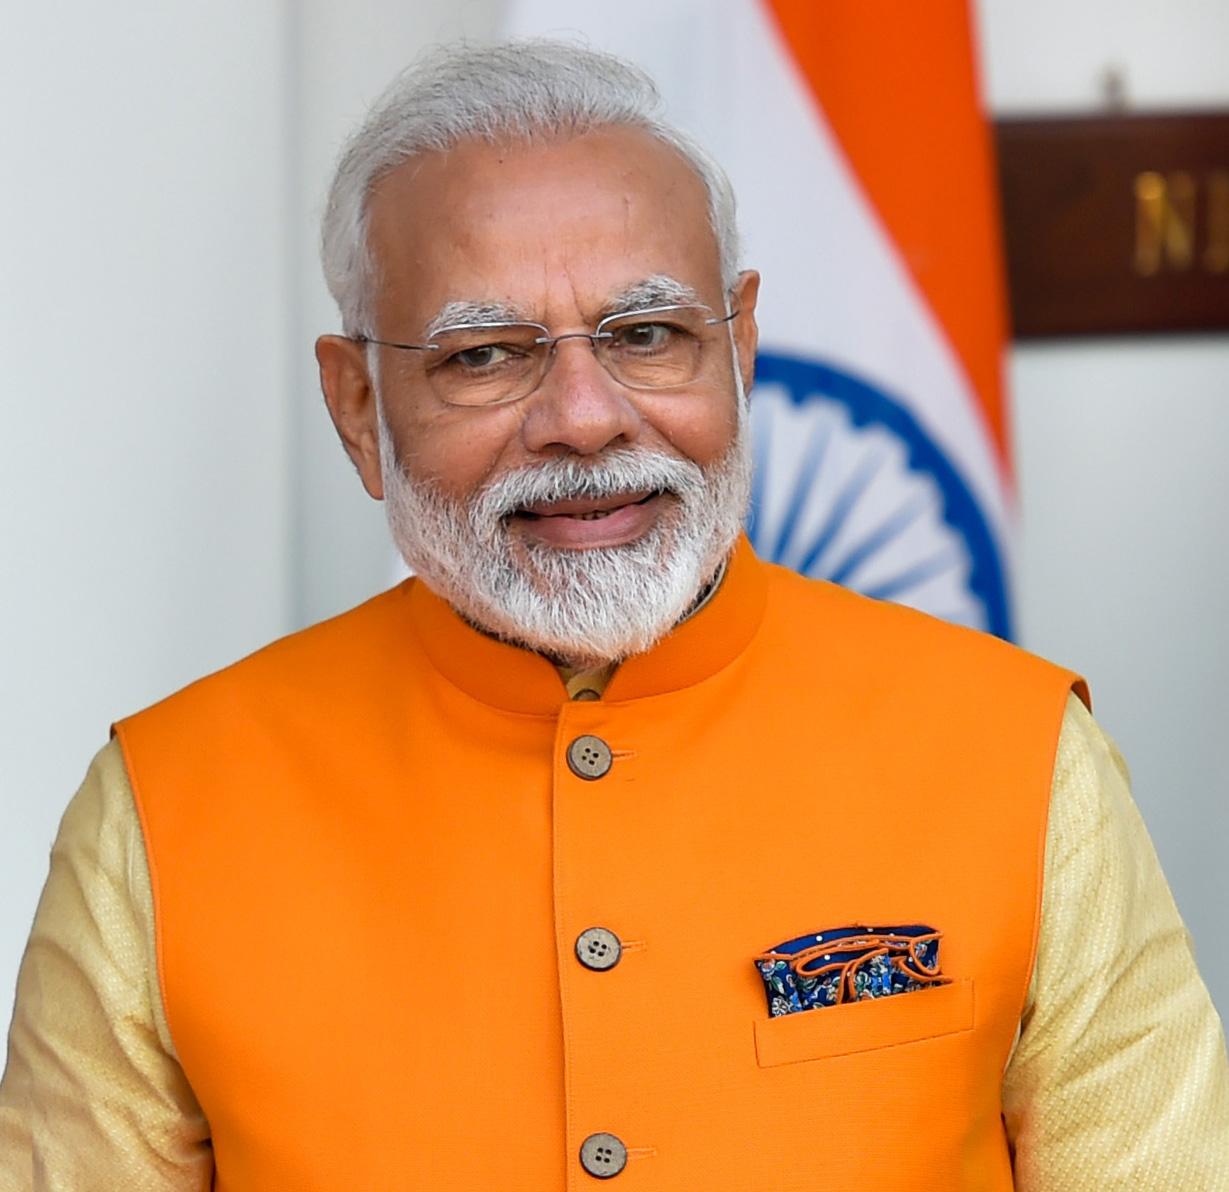 Mizoram: Chakma bodies urge PM Modi for sealing India-Myanmar border to  check illegal migration, smuggling   Deccan Herald